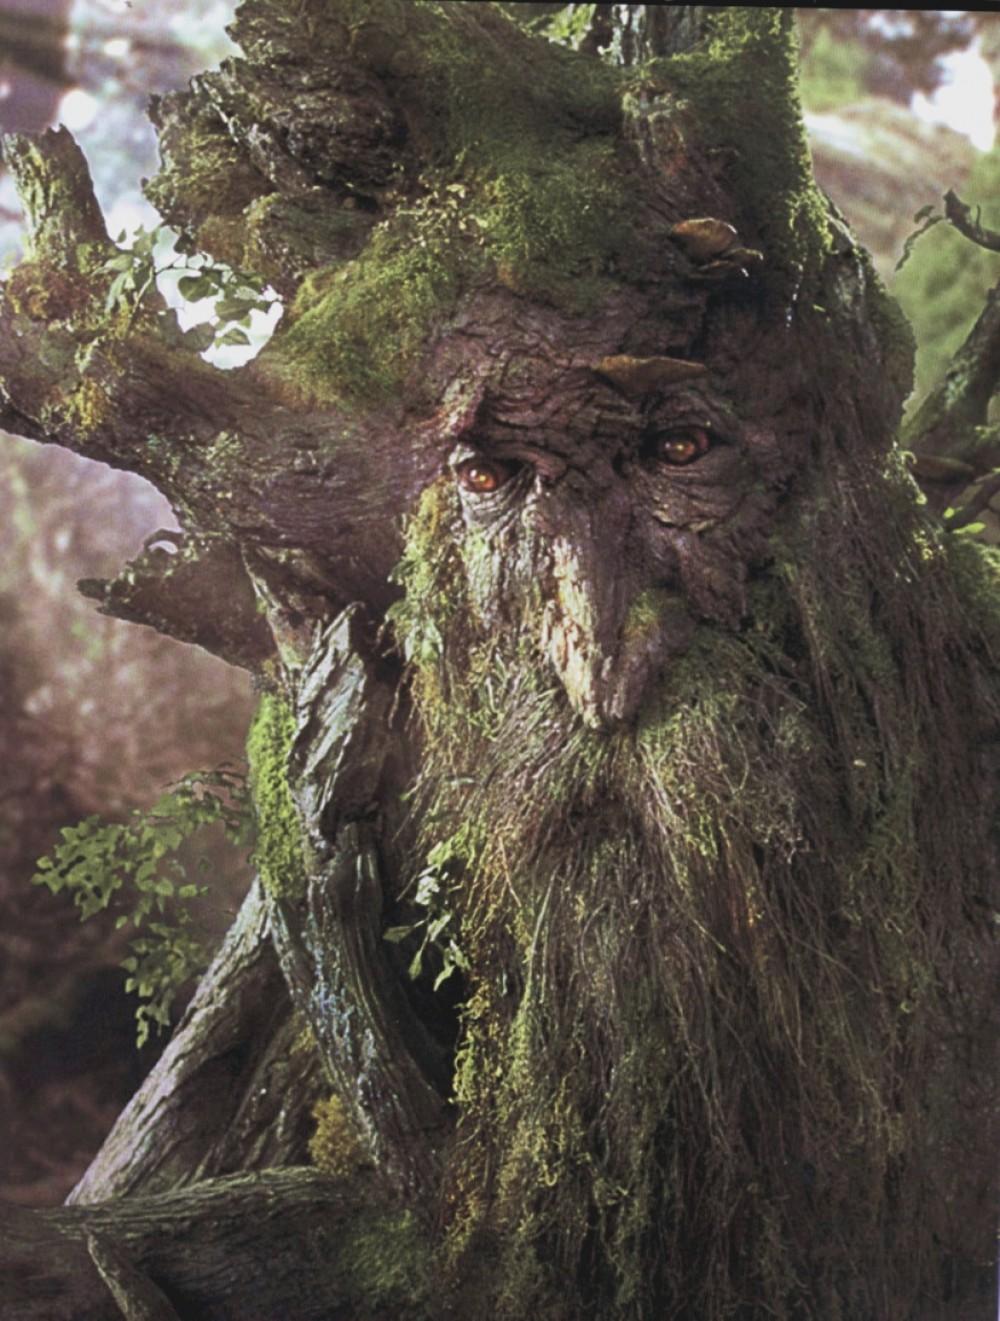 [Jeu] Association d'images - Page 19 Treebeard-the-ent-e1269783419659